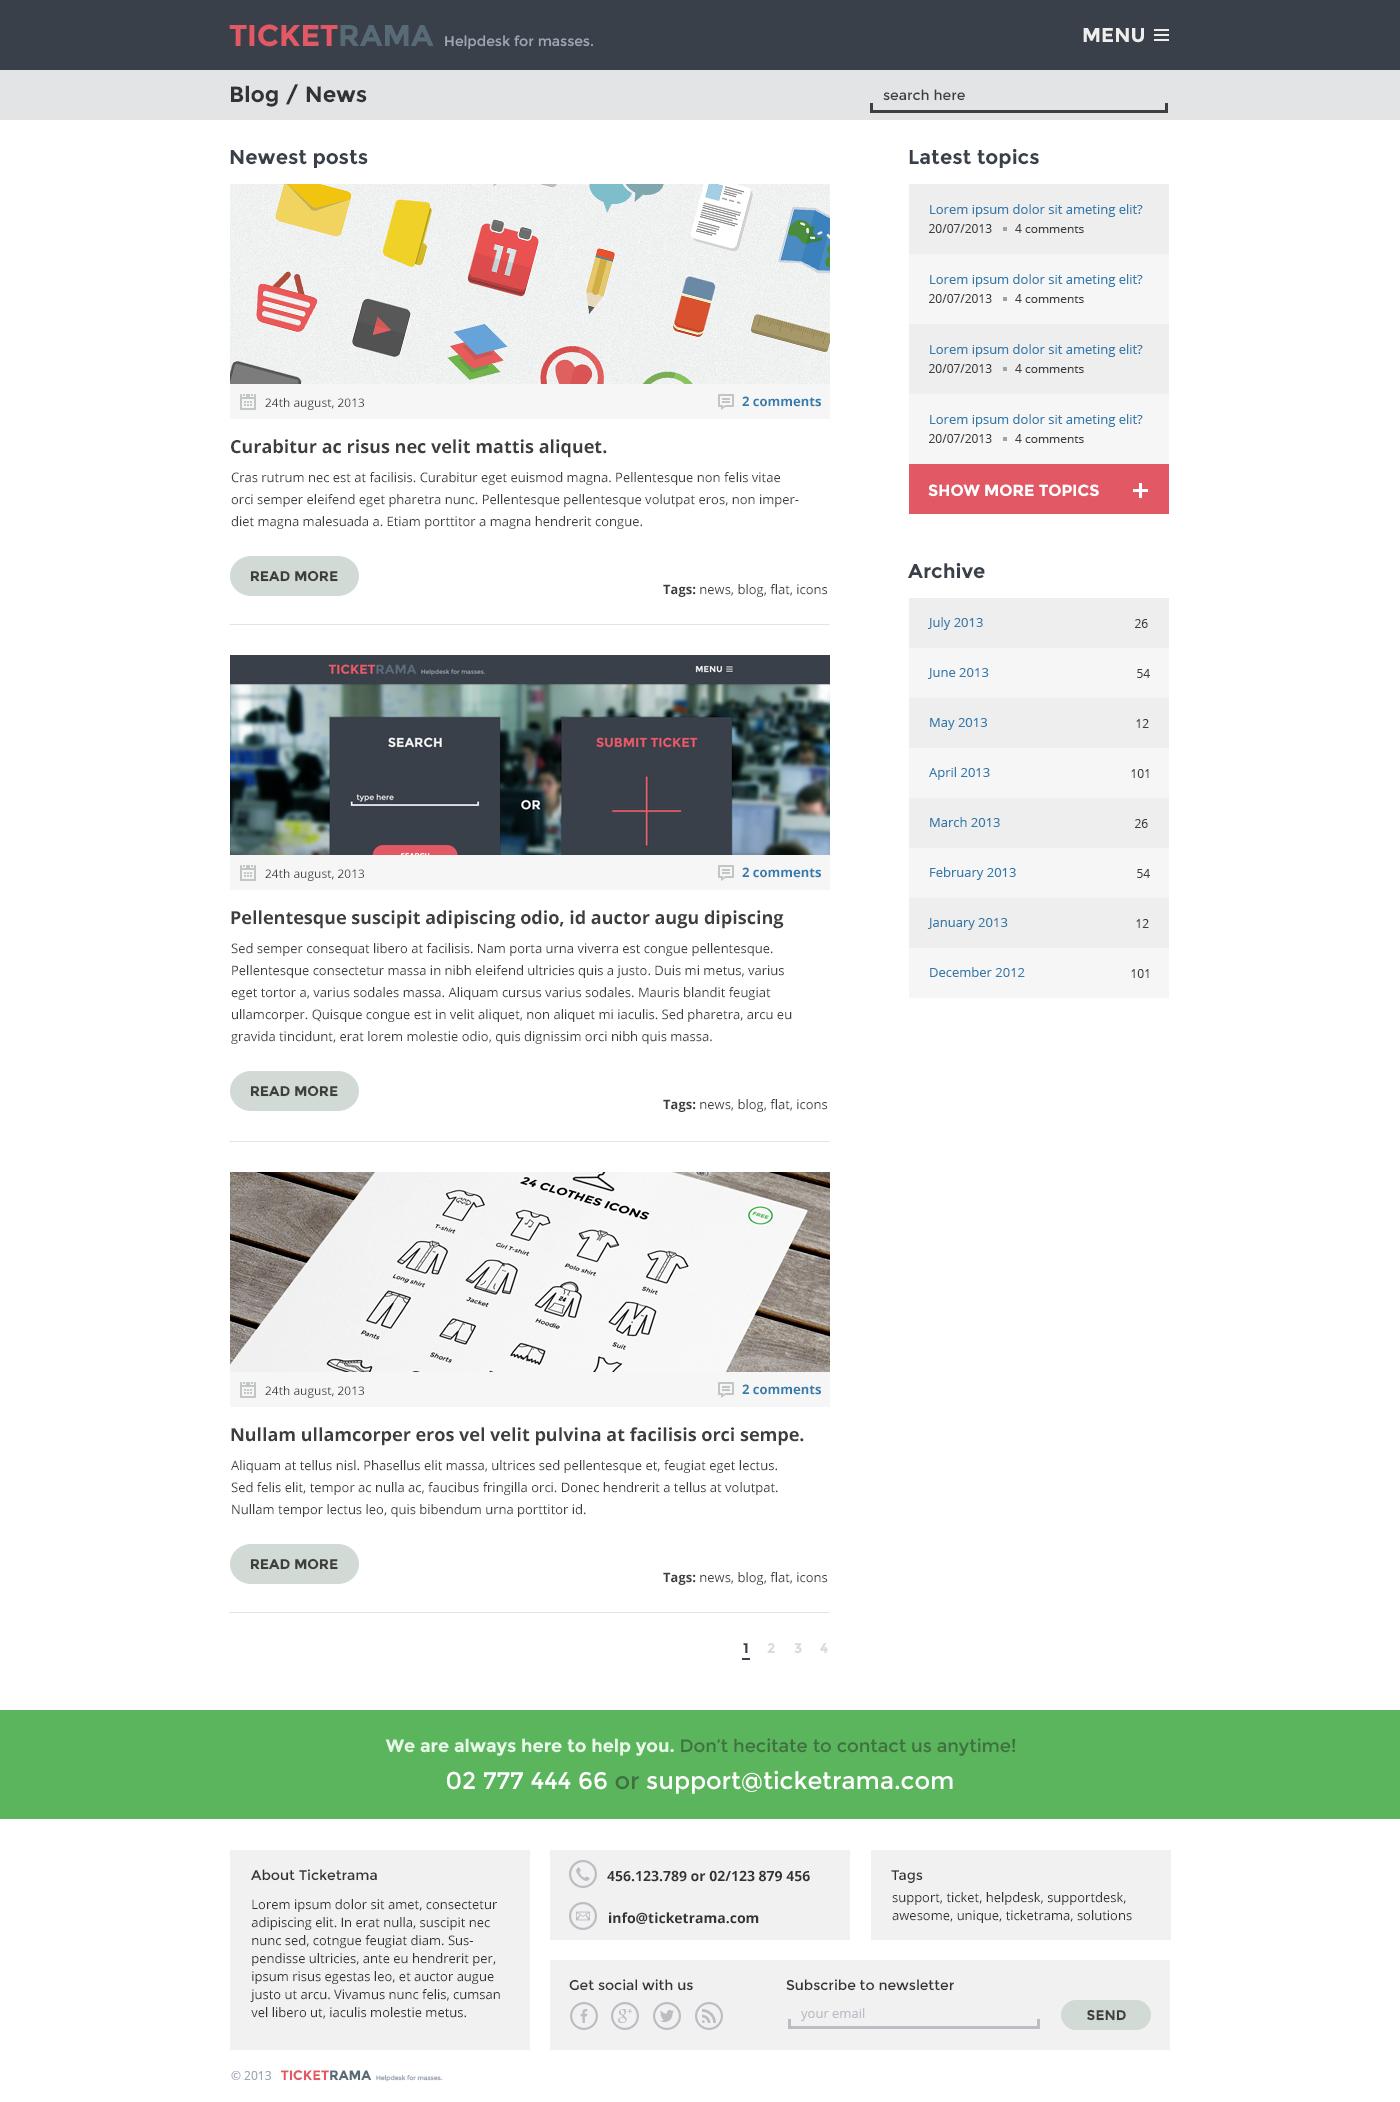 Ticketrama - Wordpress Helpdesk   Ticket   Support